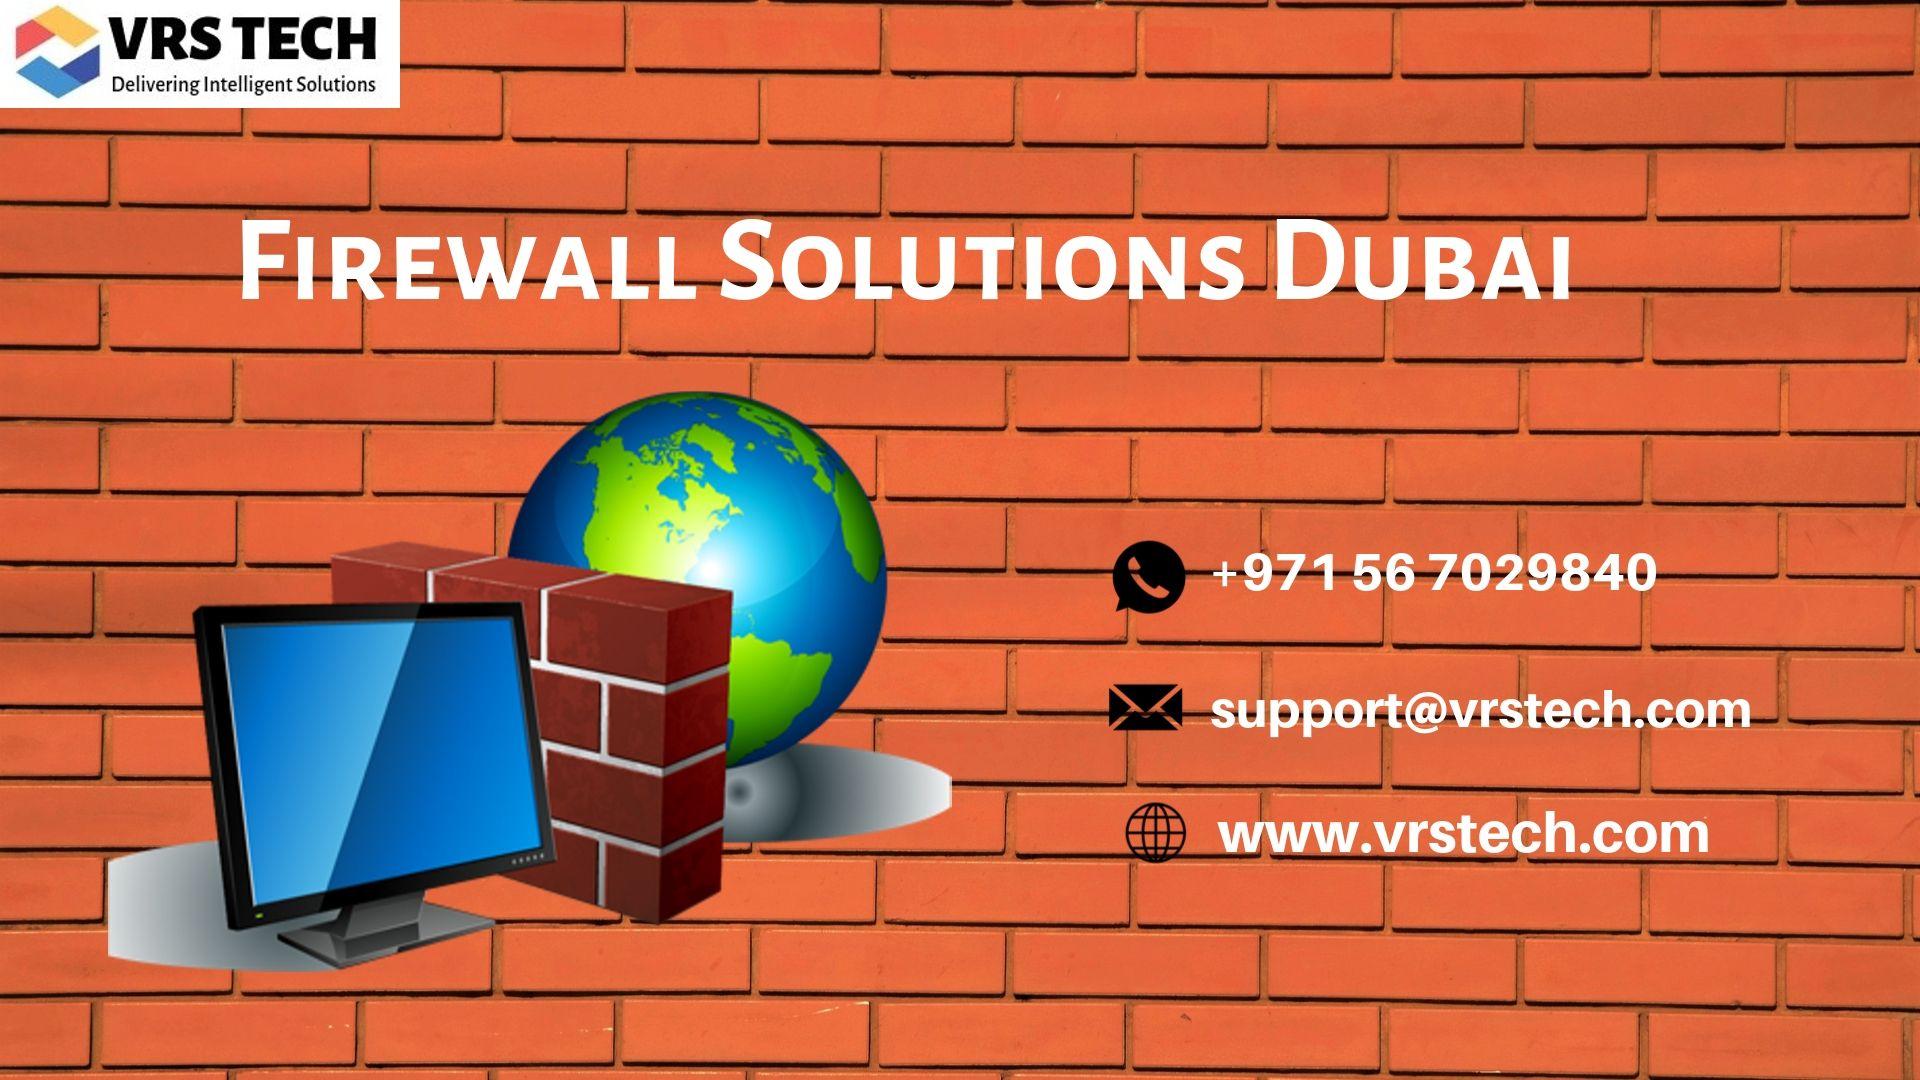 Firewall Solutions Dubai.jpg